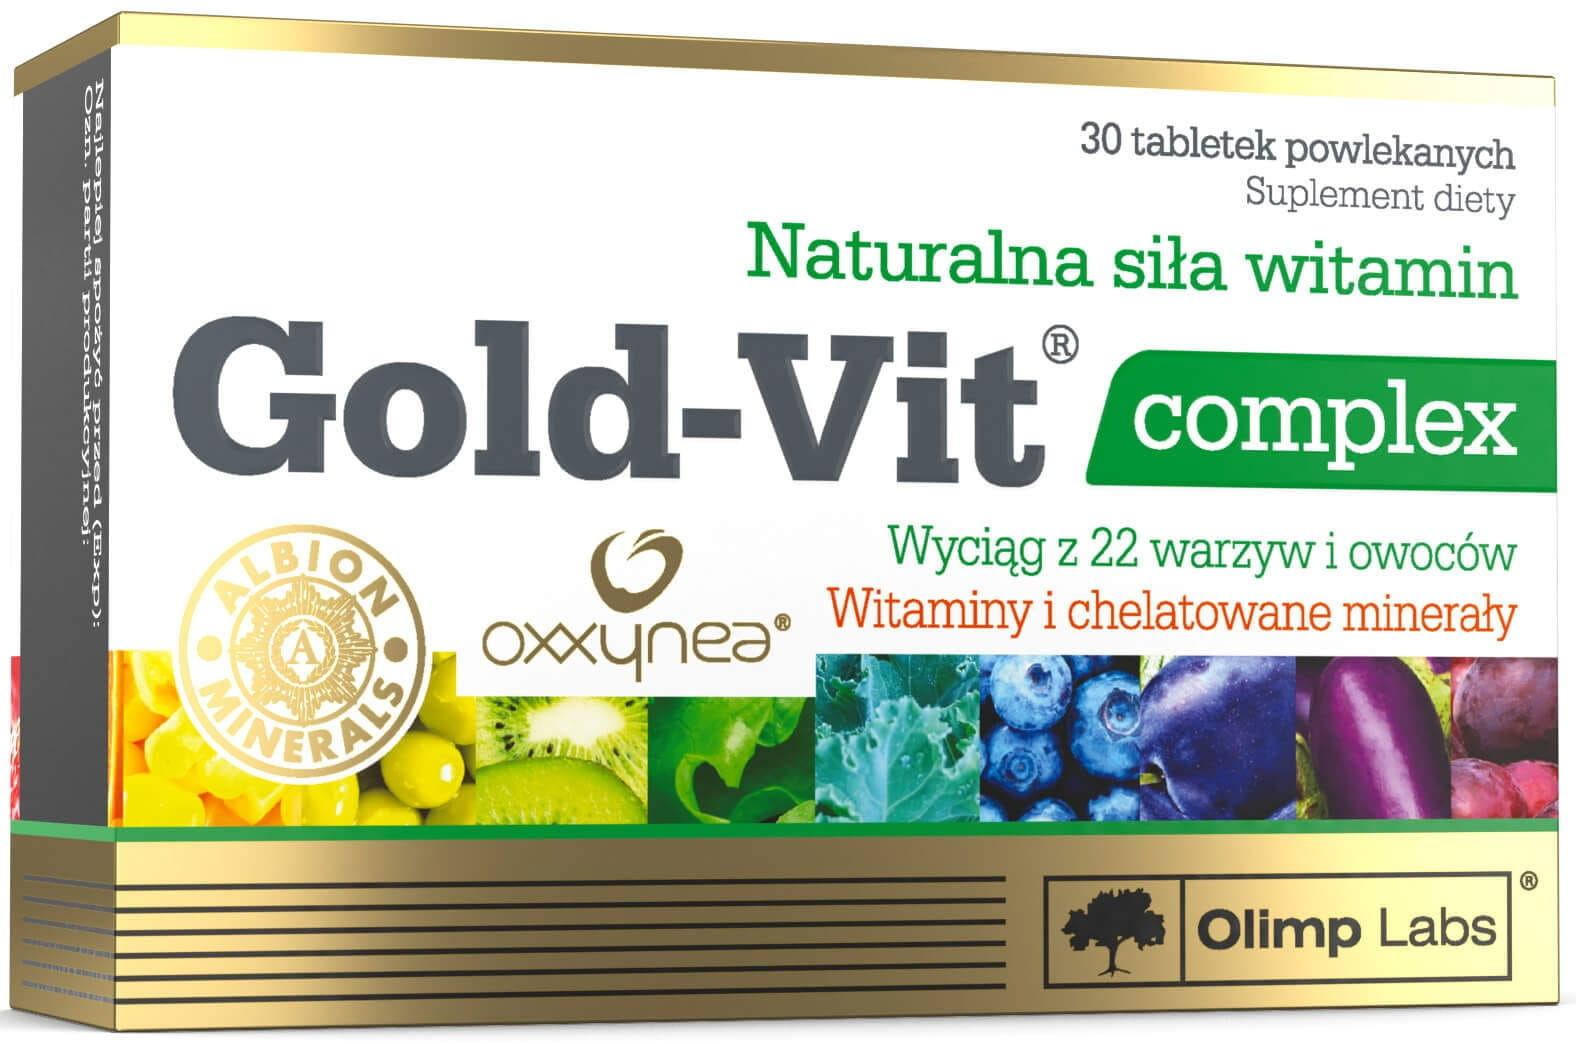 Gold-Vit C  Complex Suplement Diety 30 Tabletek - Olimp Labs